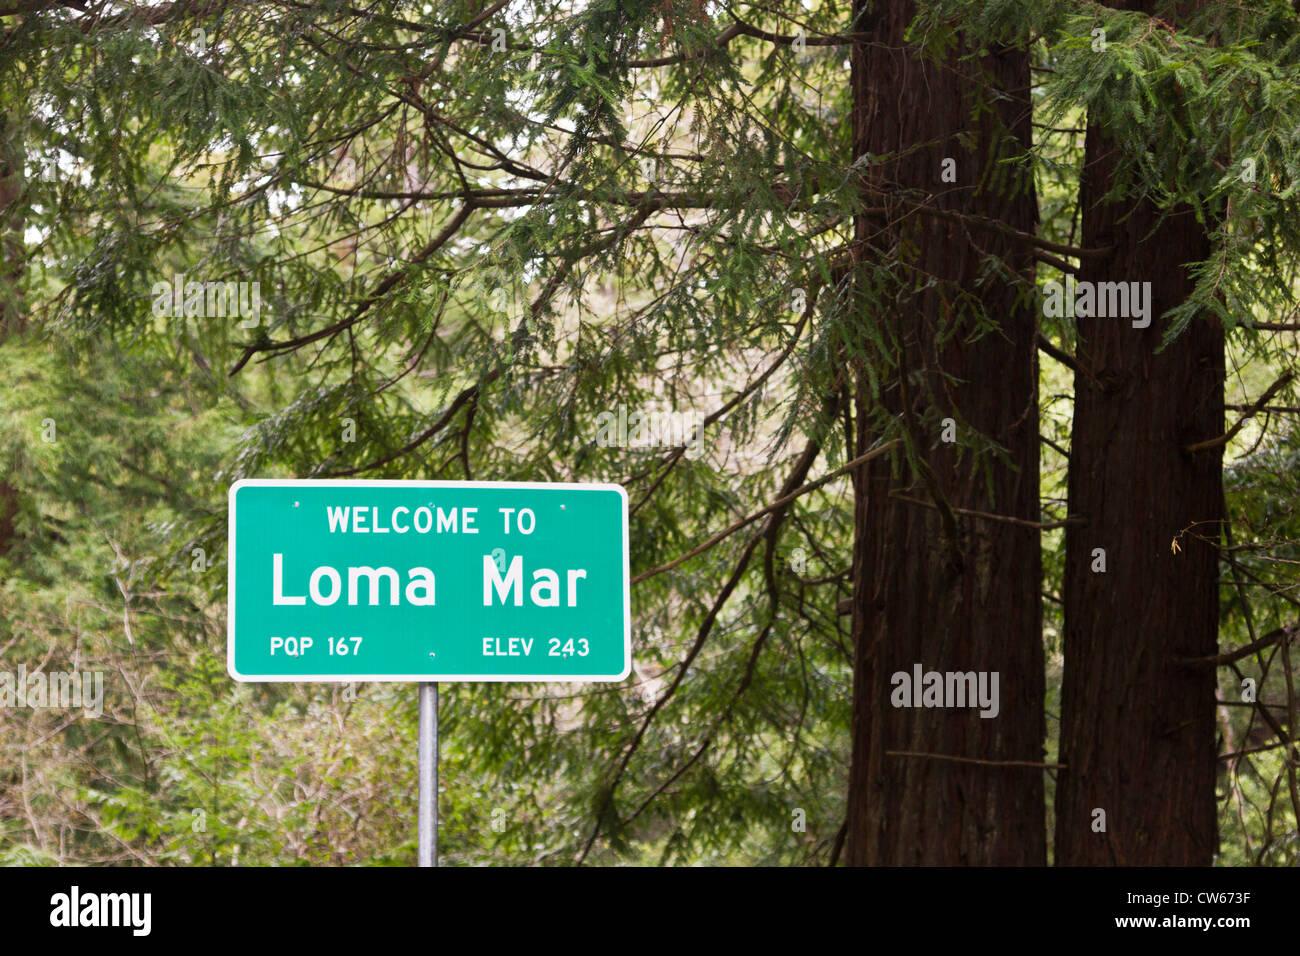 Loma Mar redwoods in the Santa Cruz Mountains - Stock Image